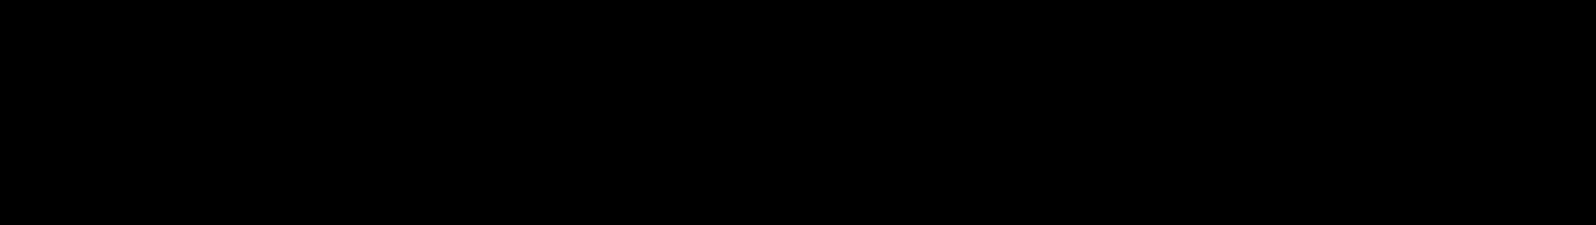 In Development Logo 1.png